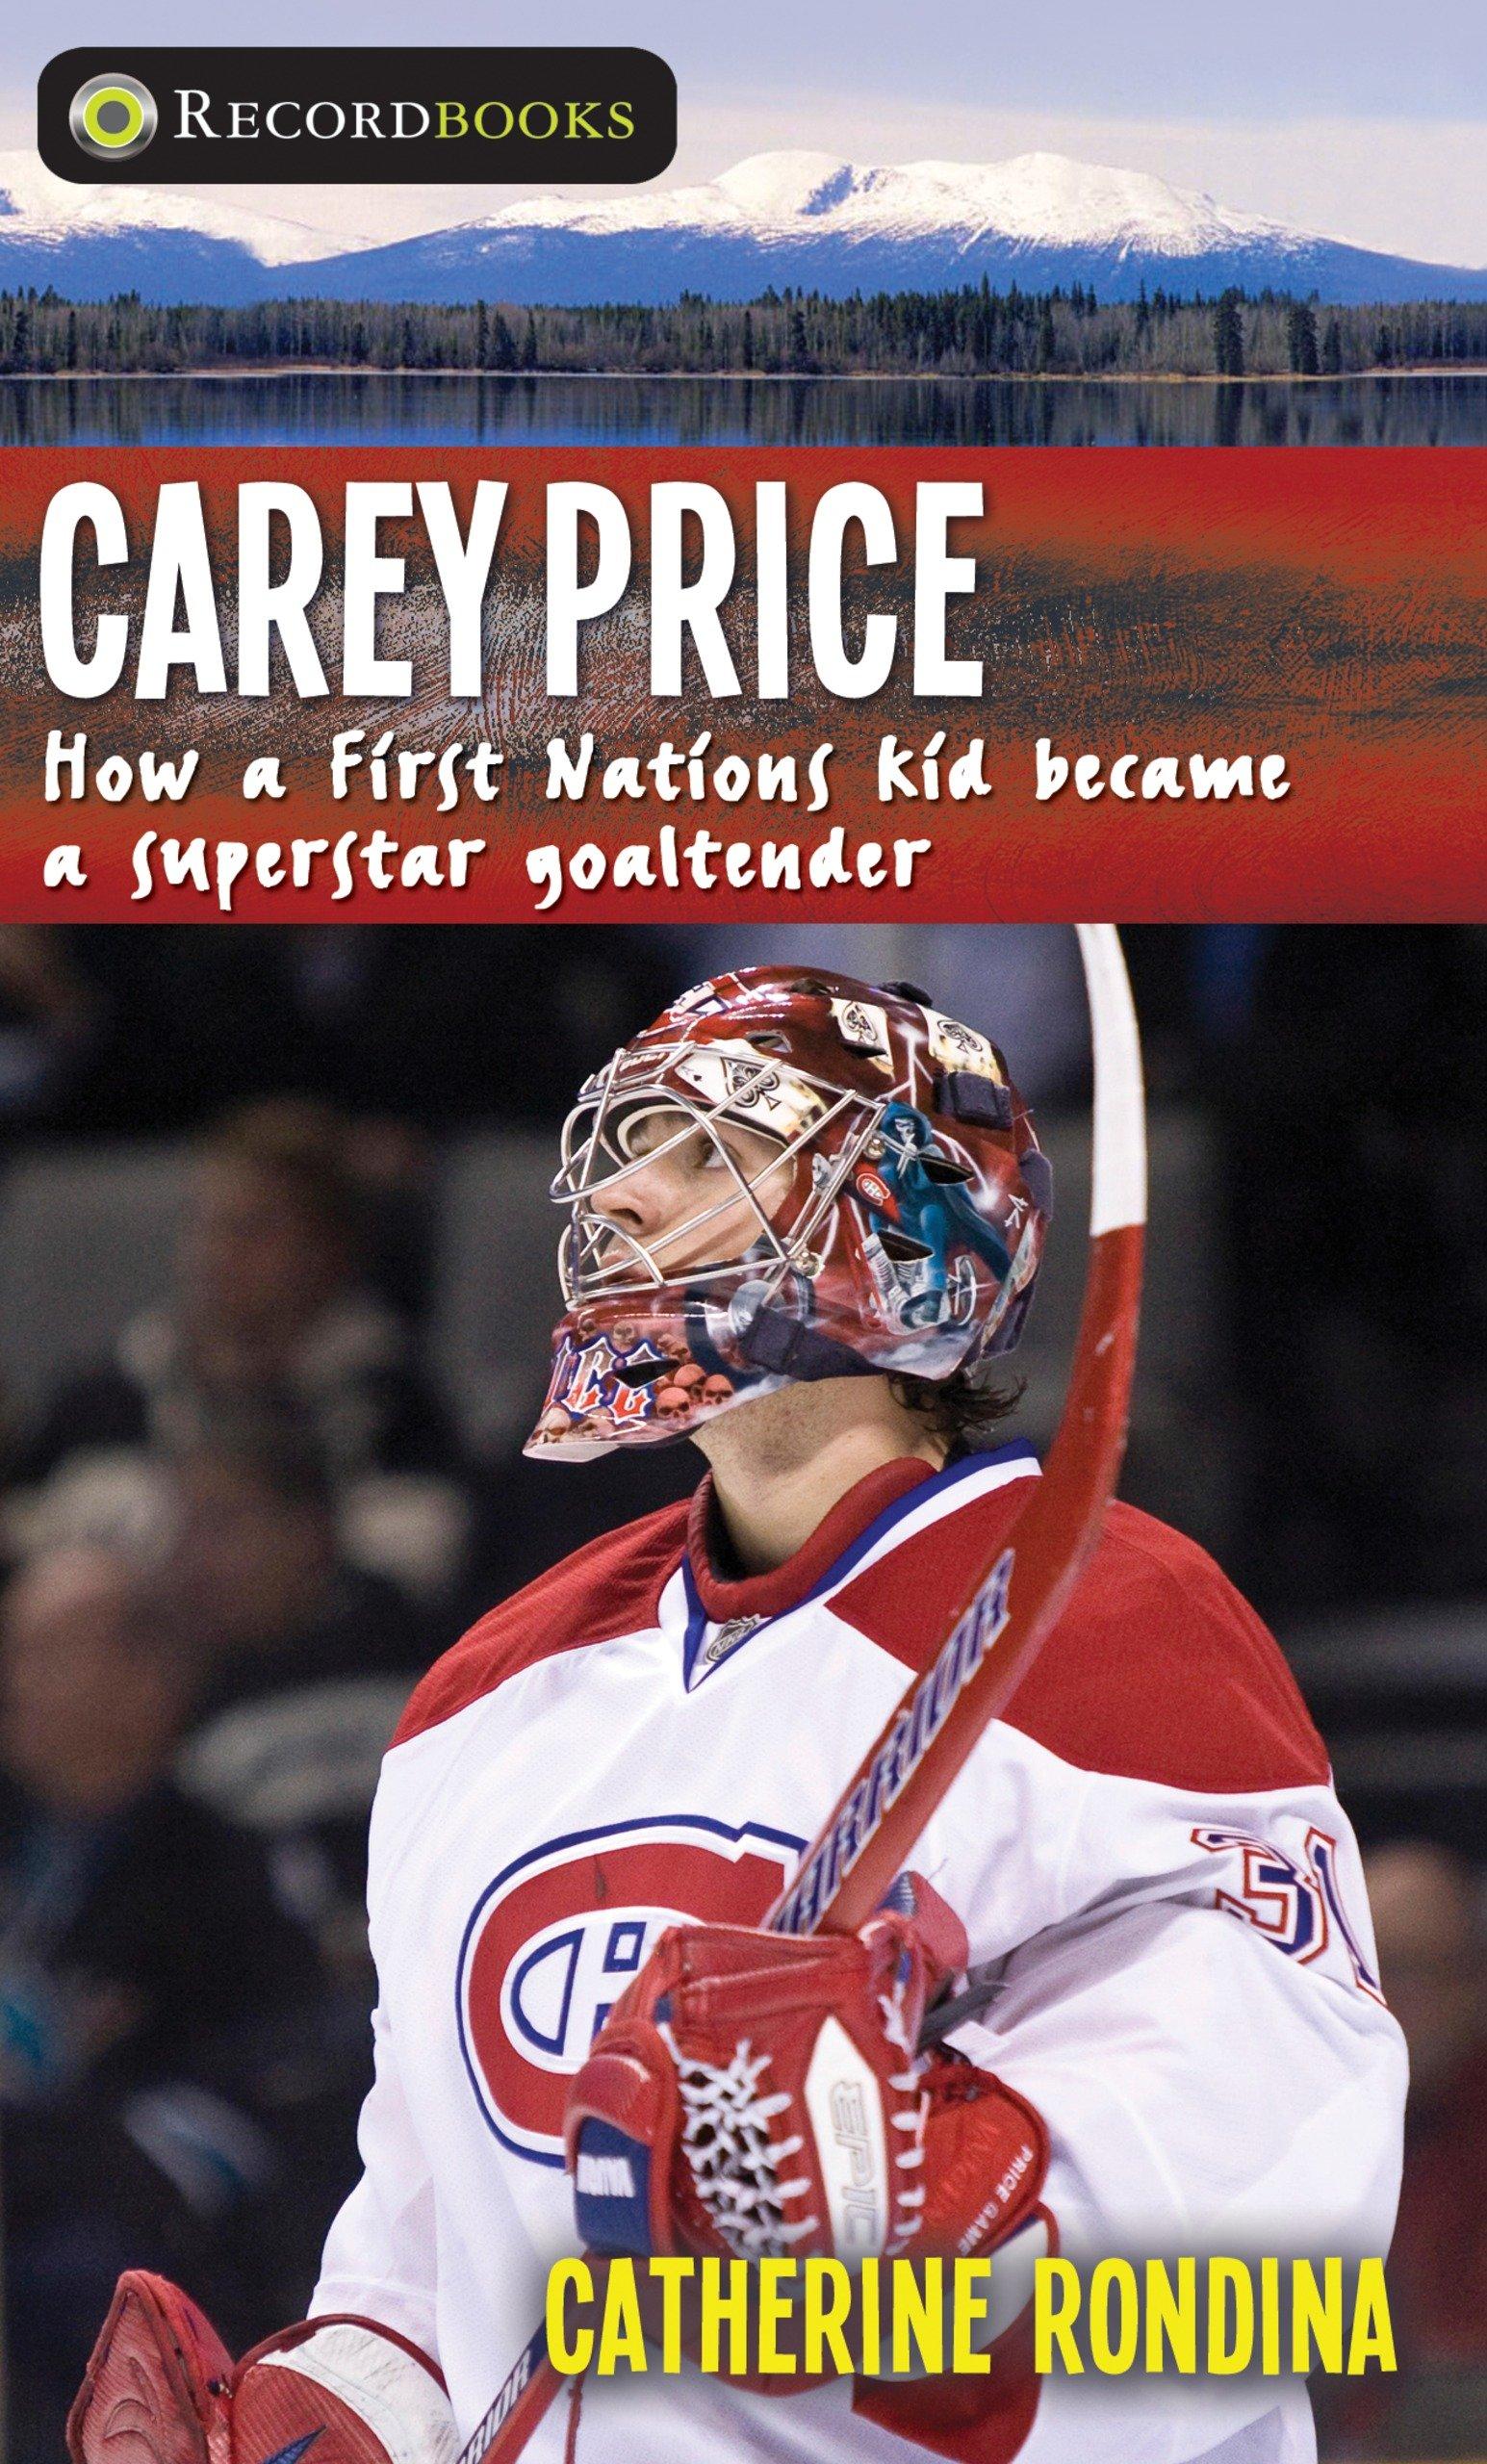 Carey Price: How a First Nations kid became a superstar goaltender (Lorimer Recordbooks)